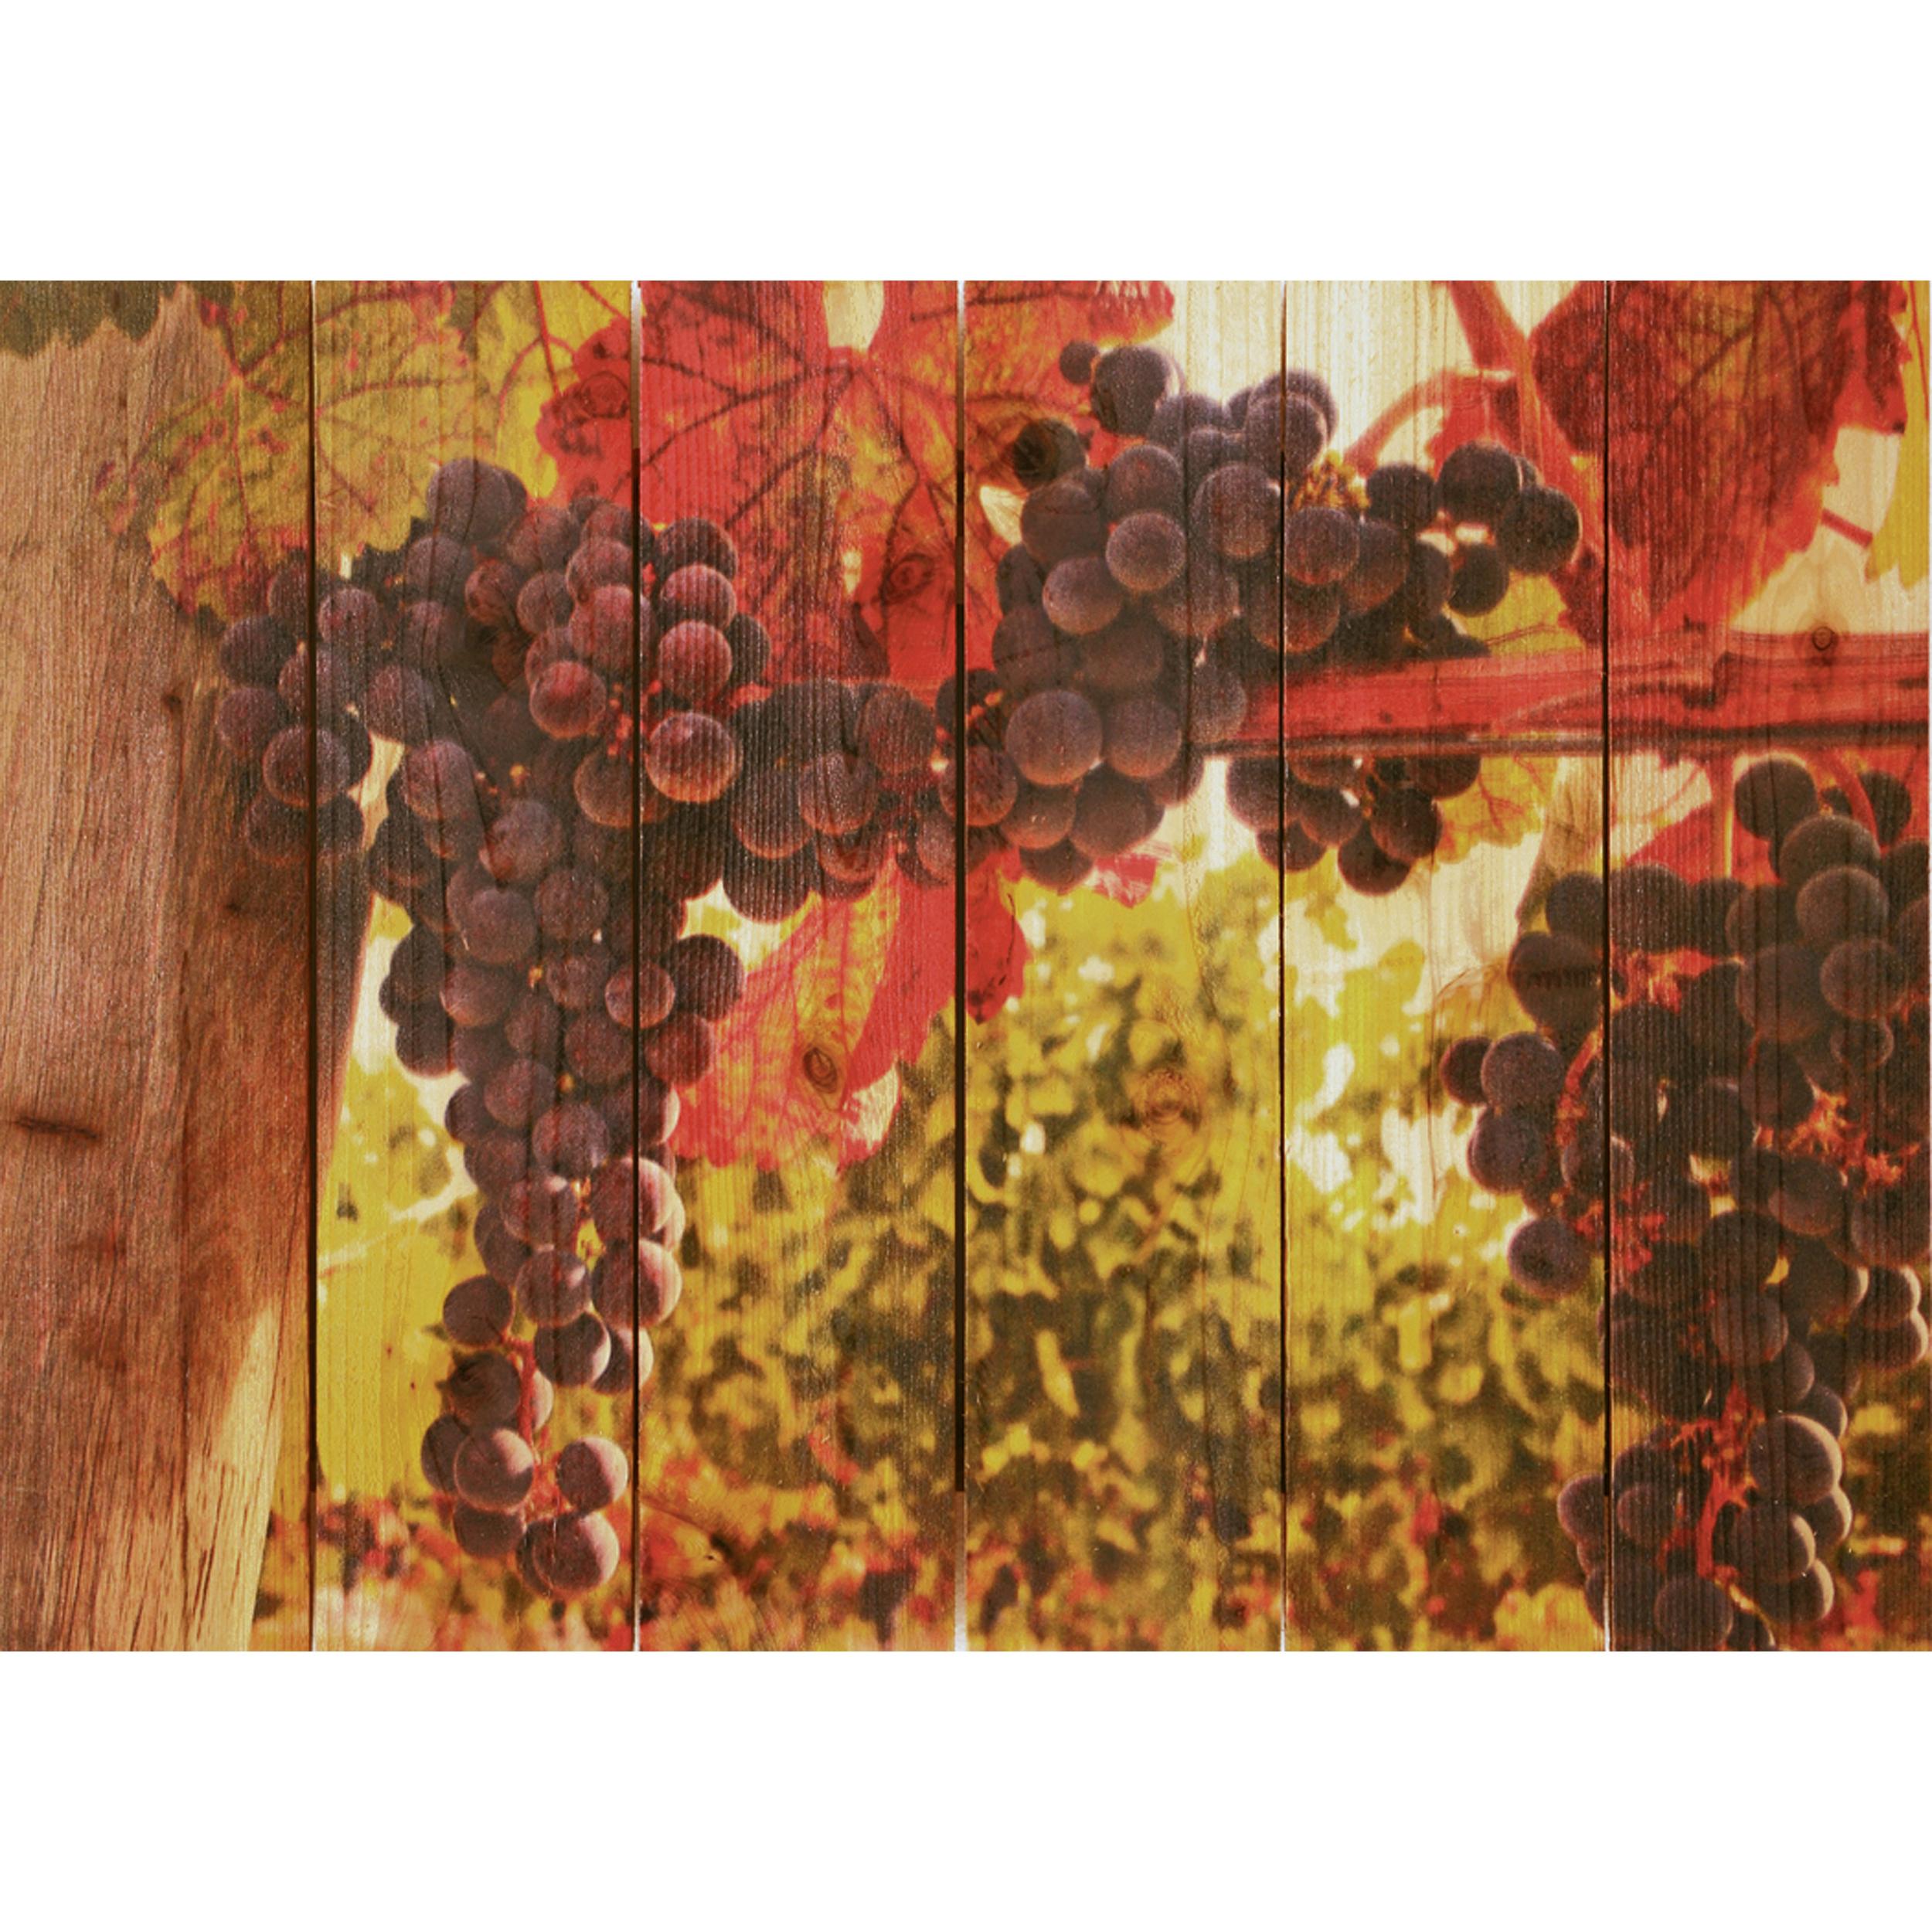 Daydream Gizaun Cedar Wall Art, Old Vines, 22.5